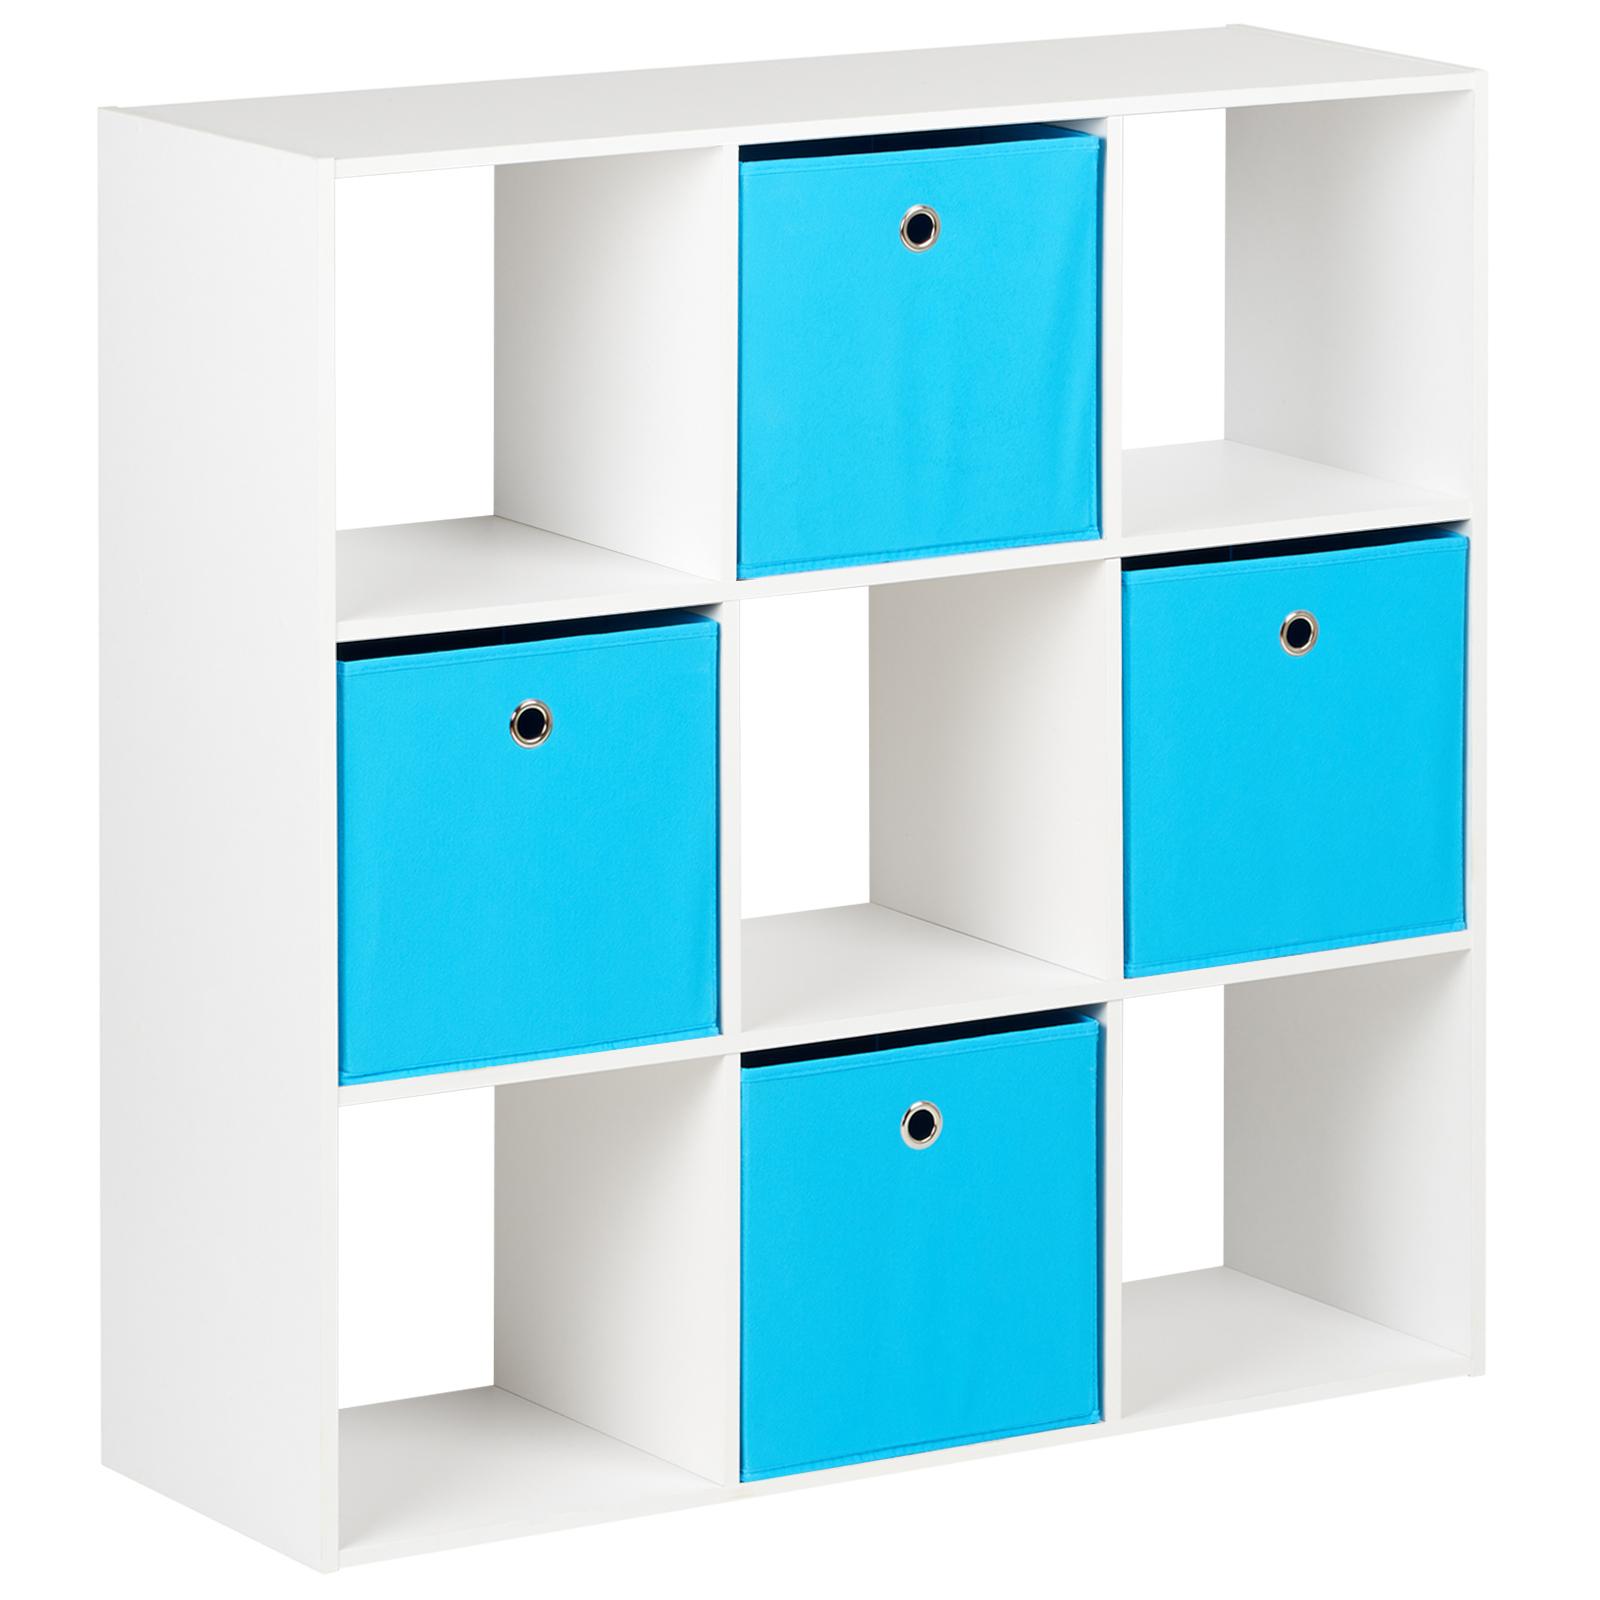 Hartleys White 8 Cube Shelving Unit Furniture Shelves 4 Blue Fabric Storage Box